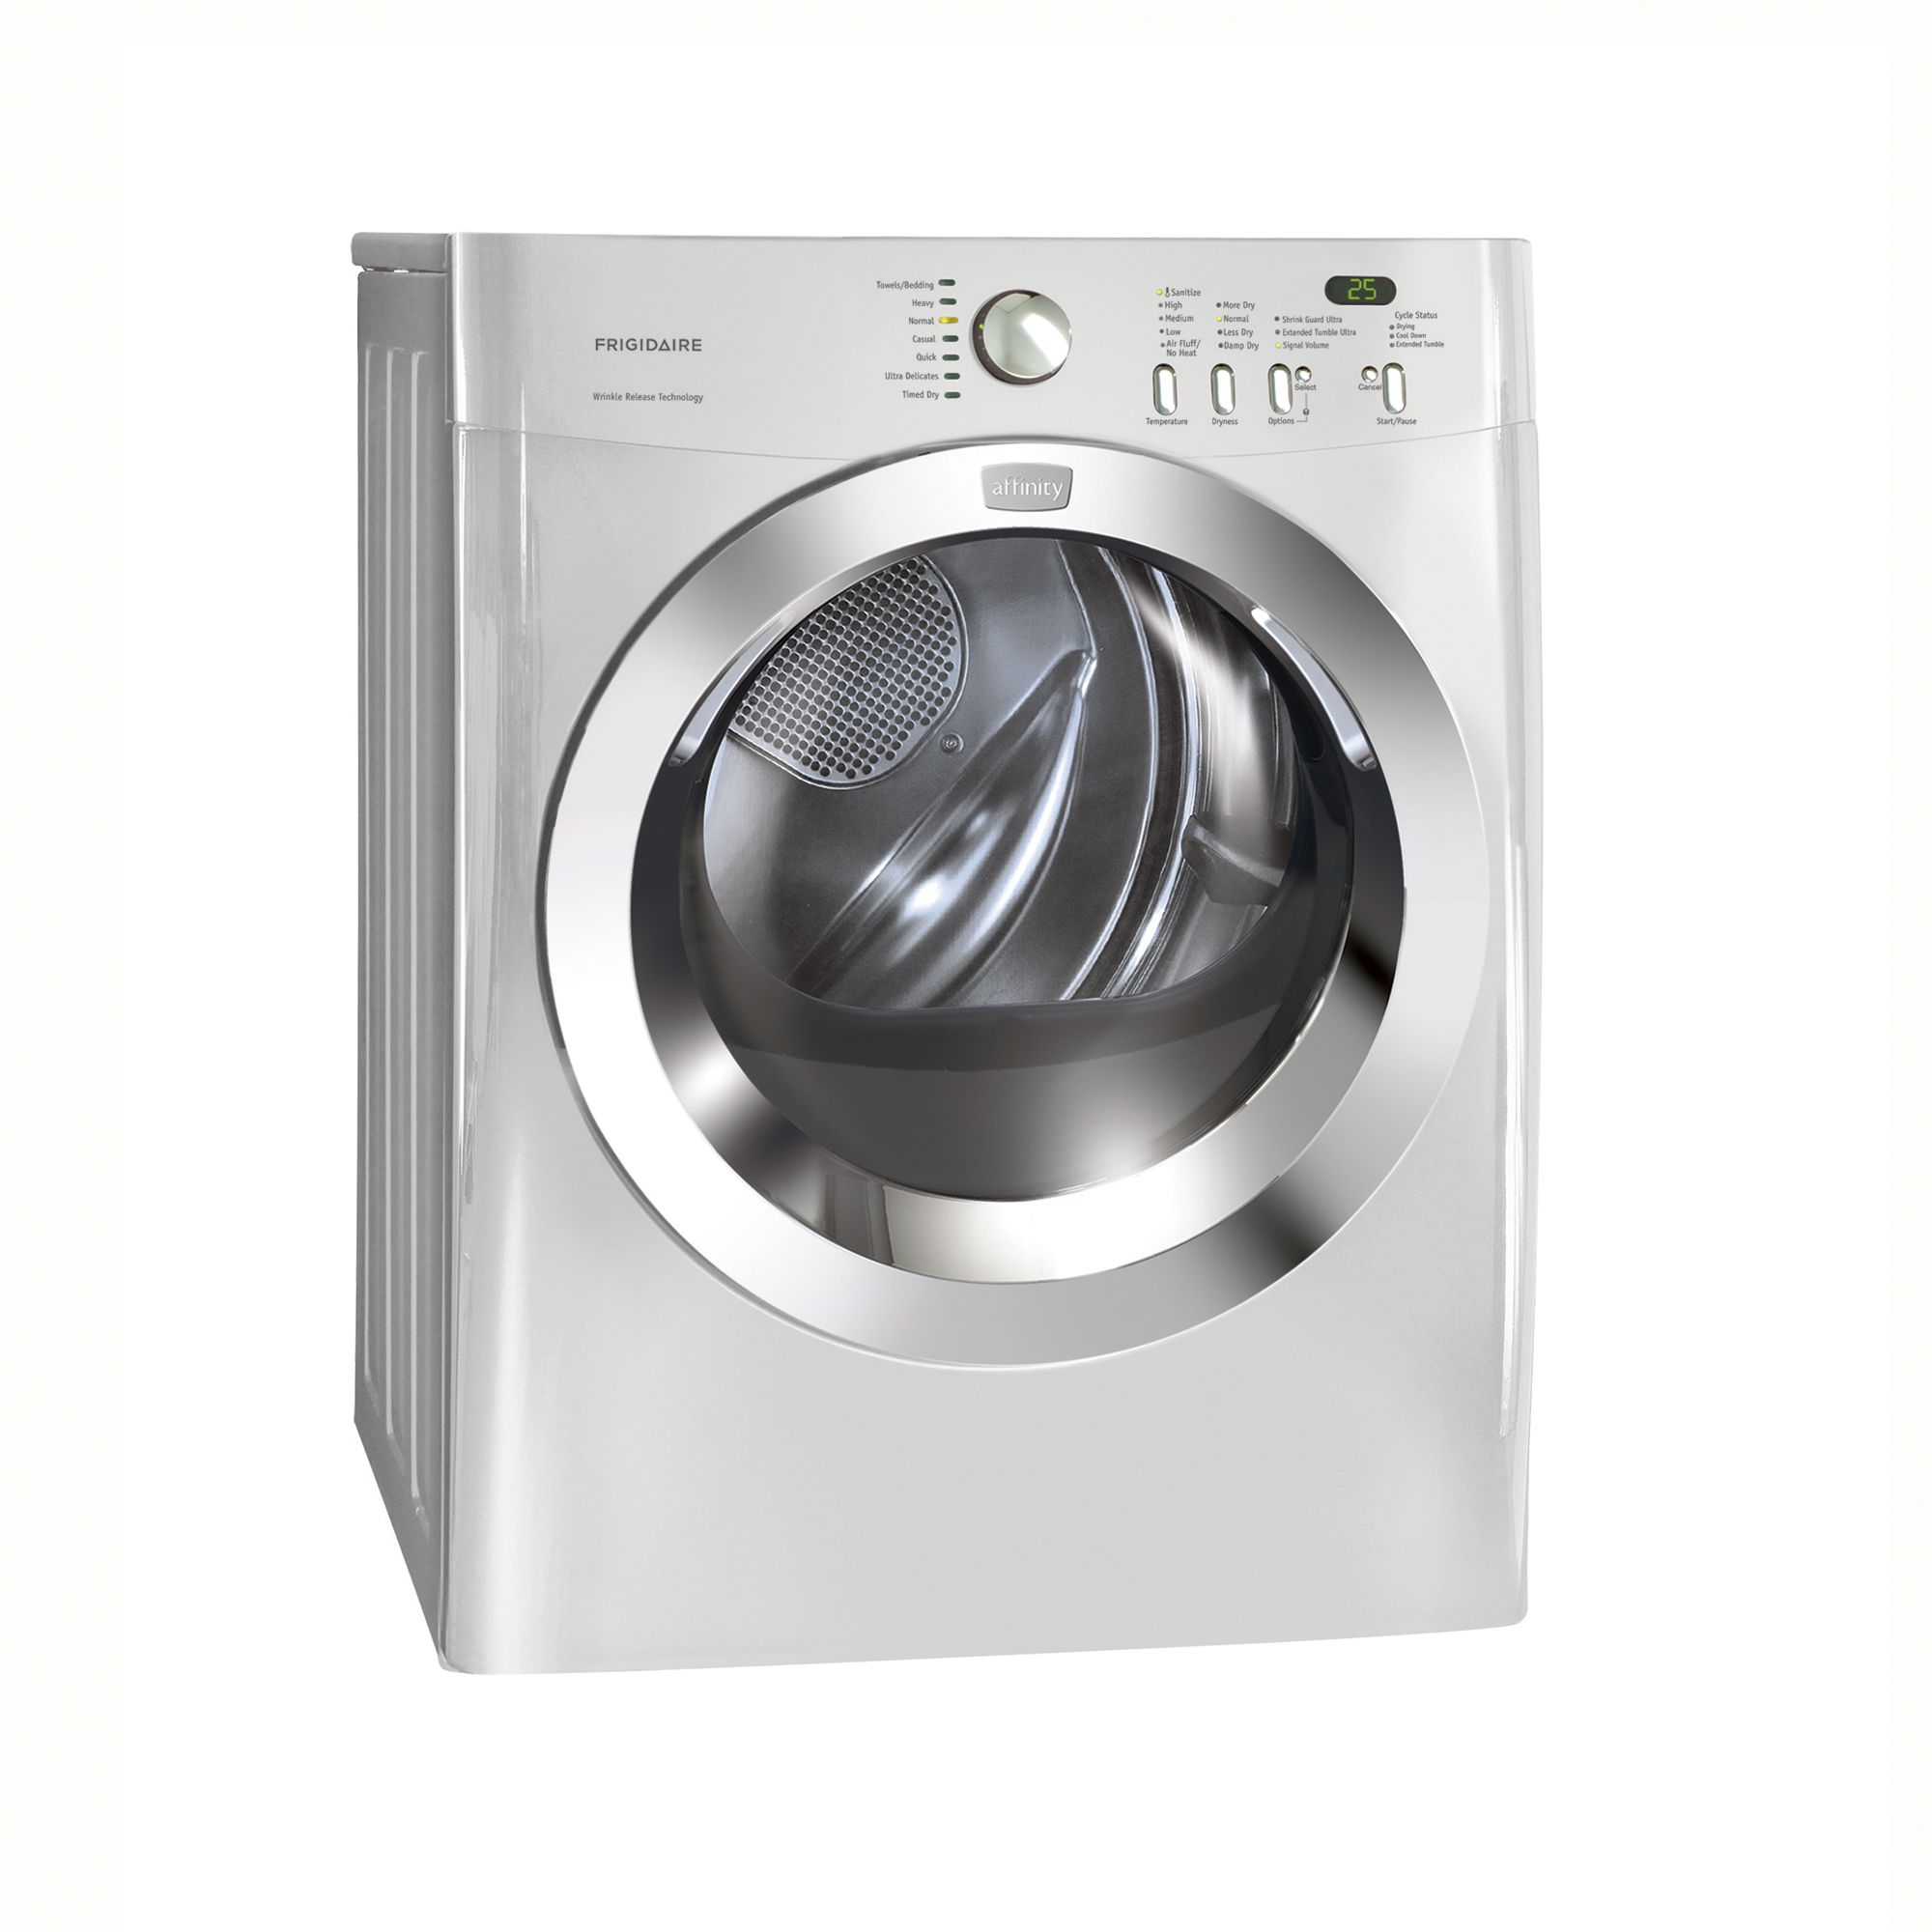 Frigidaire Affinity 7.0 cu. ft. Electric Dryer - FAQE7077K